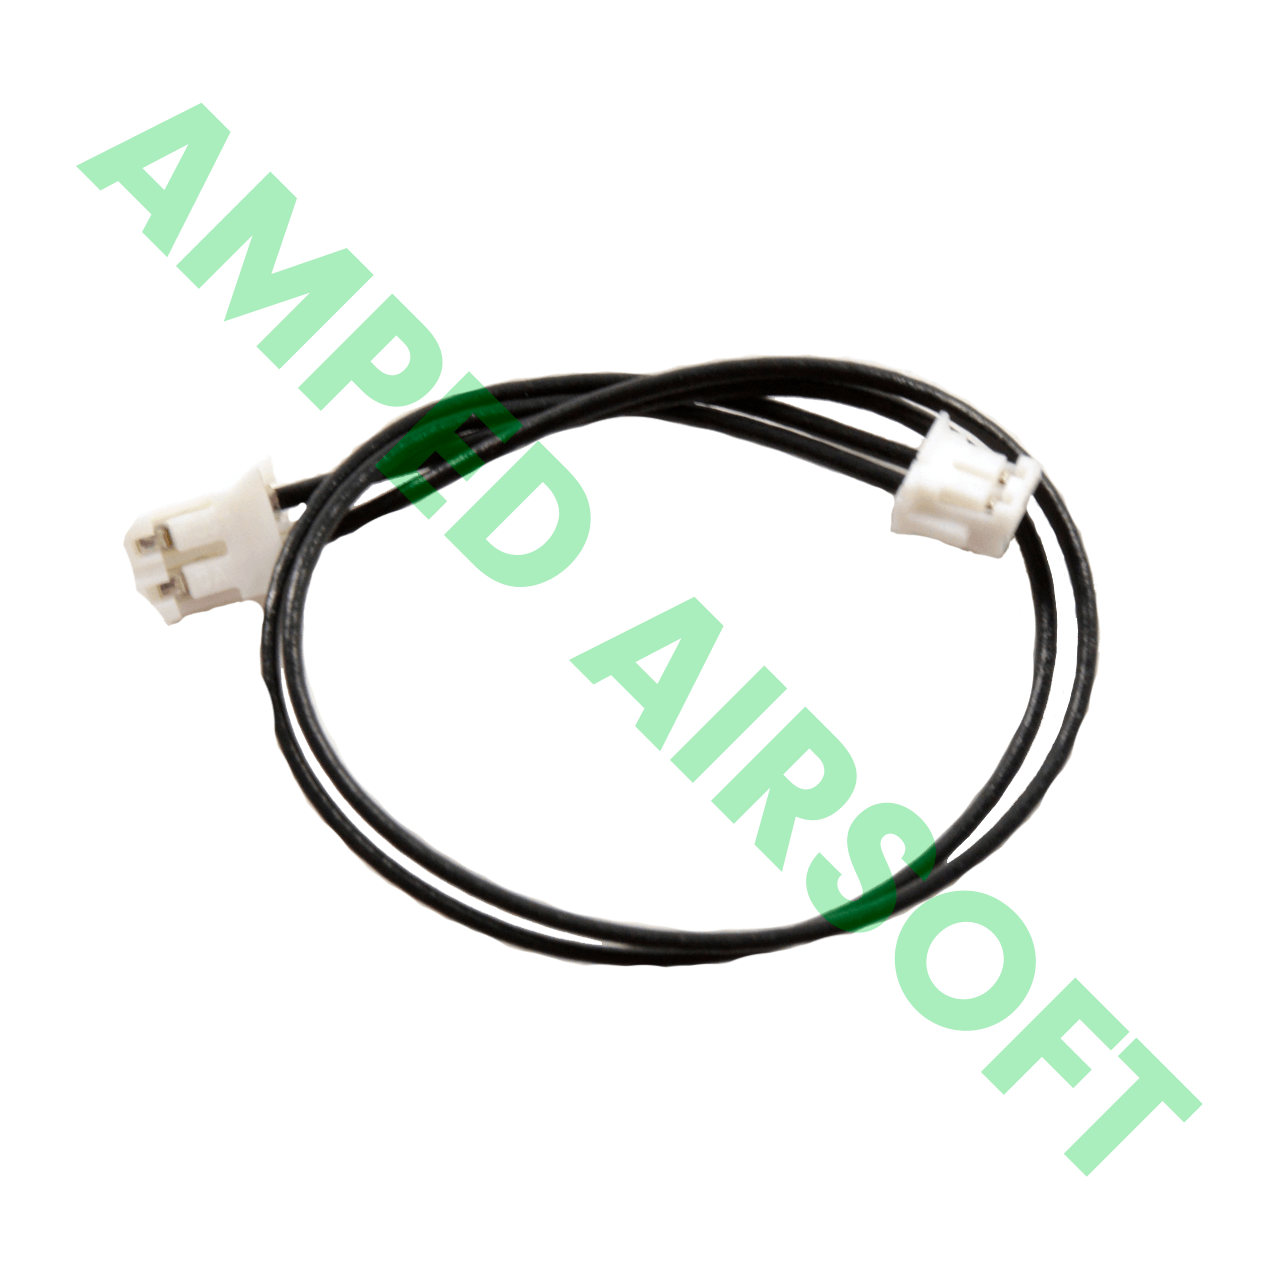 medium resolution of  ferrari 360 f1 transmission wiring harness used pn 181343 wiring on ferrari f430 spider